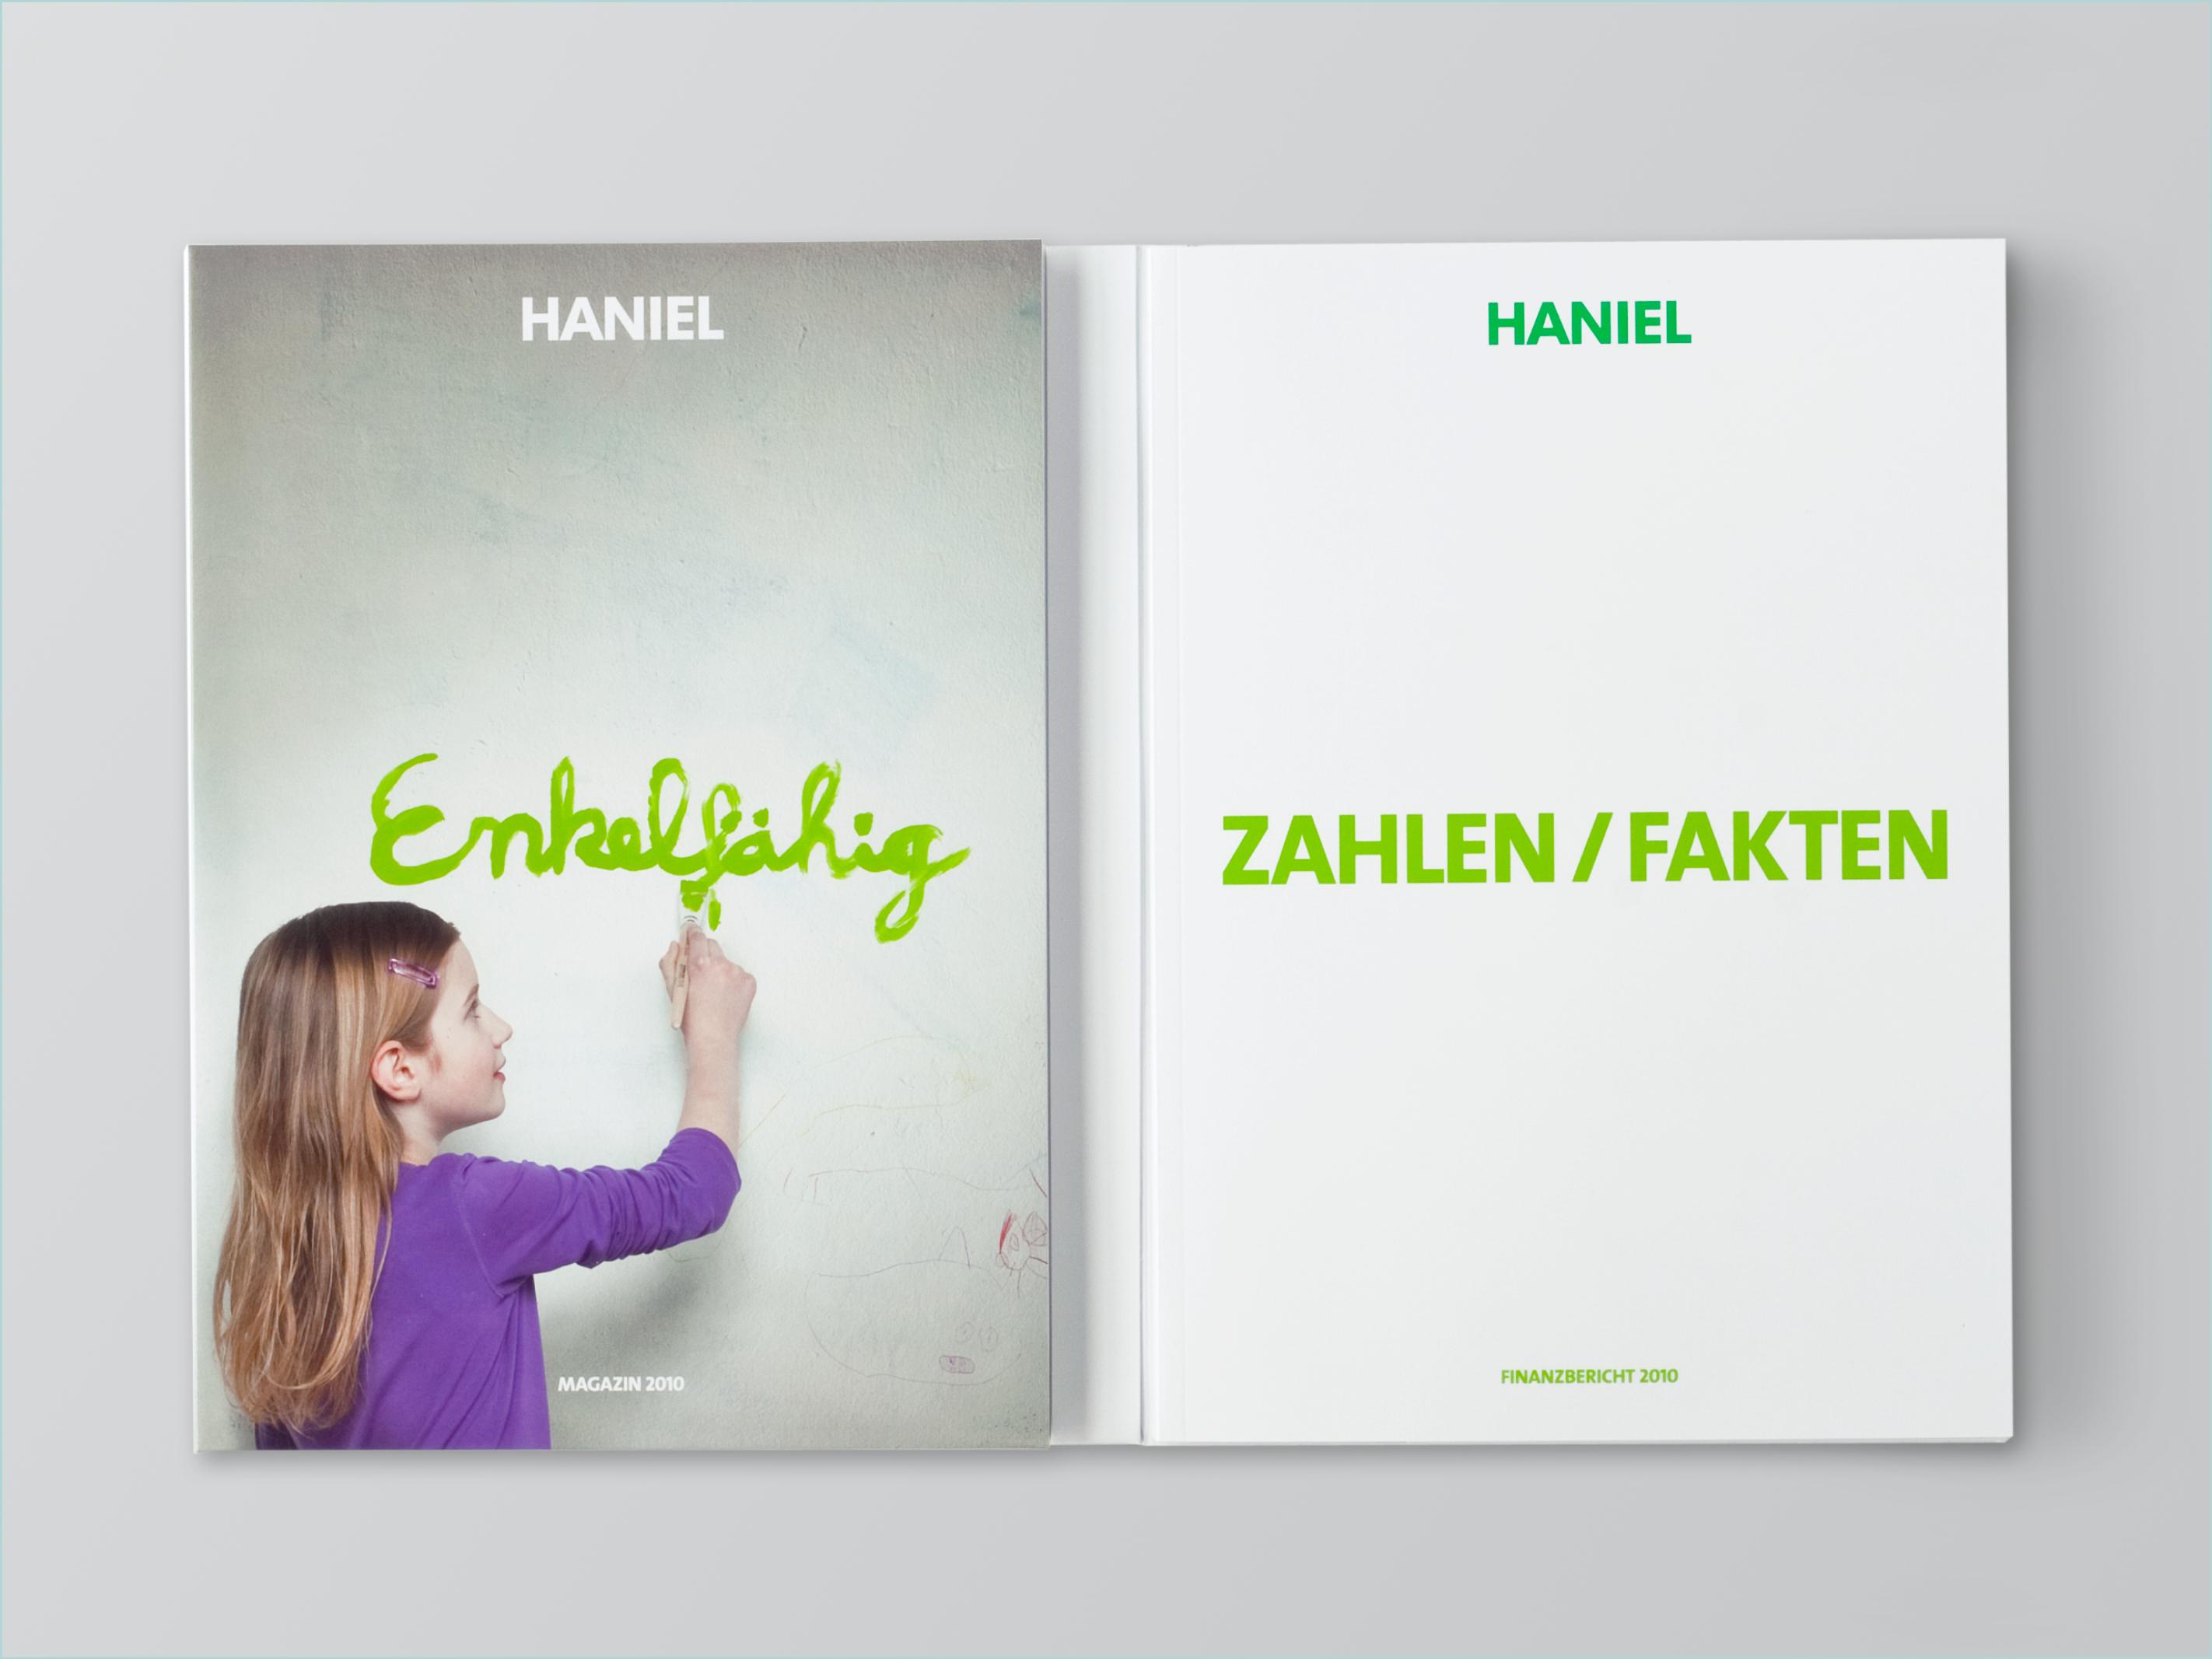 Haniel – Enkelfähig